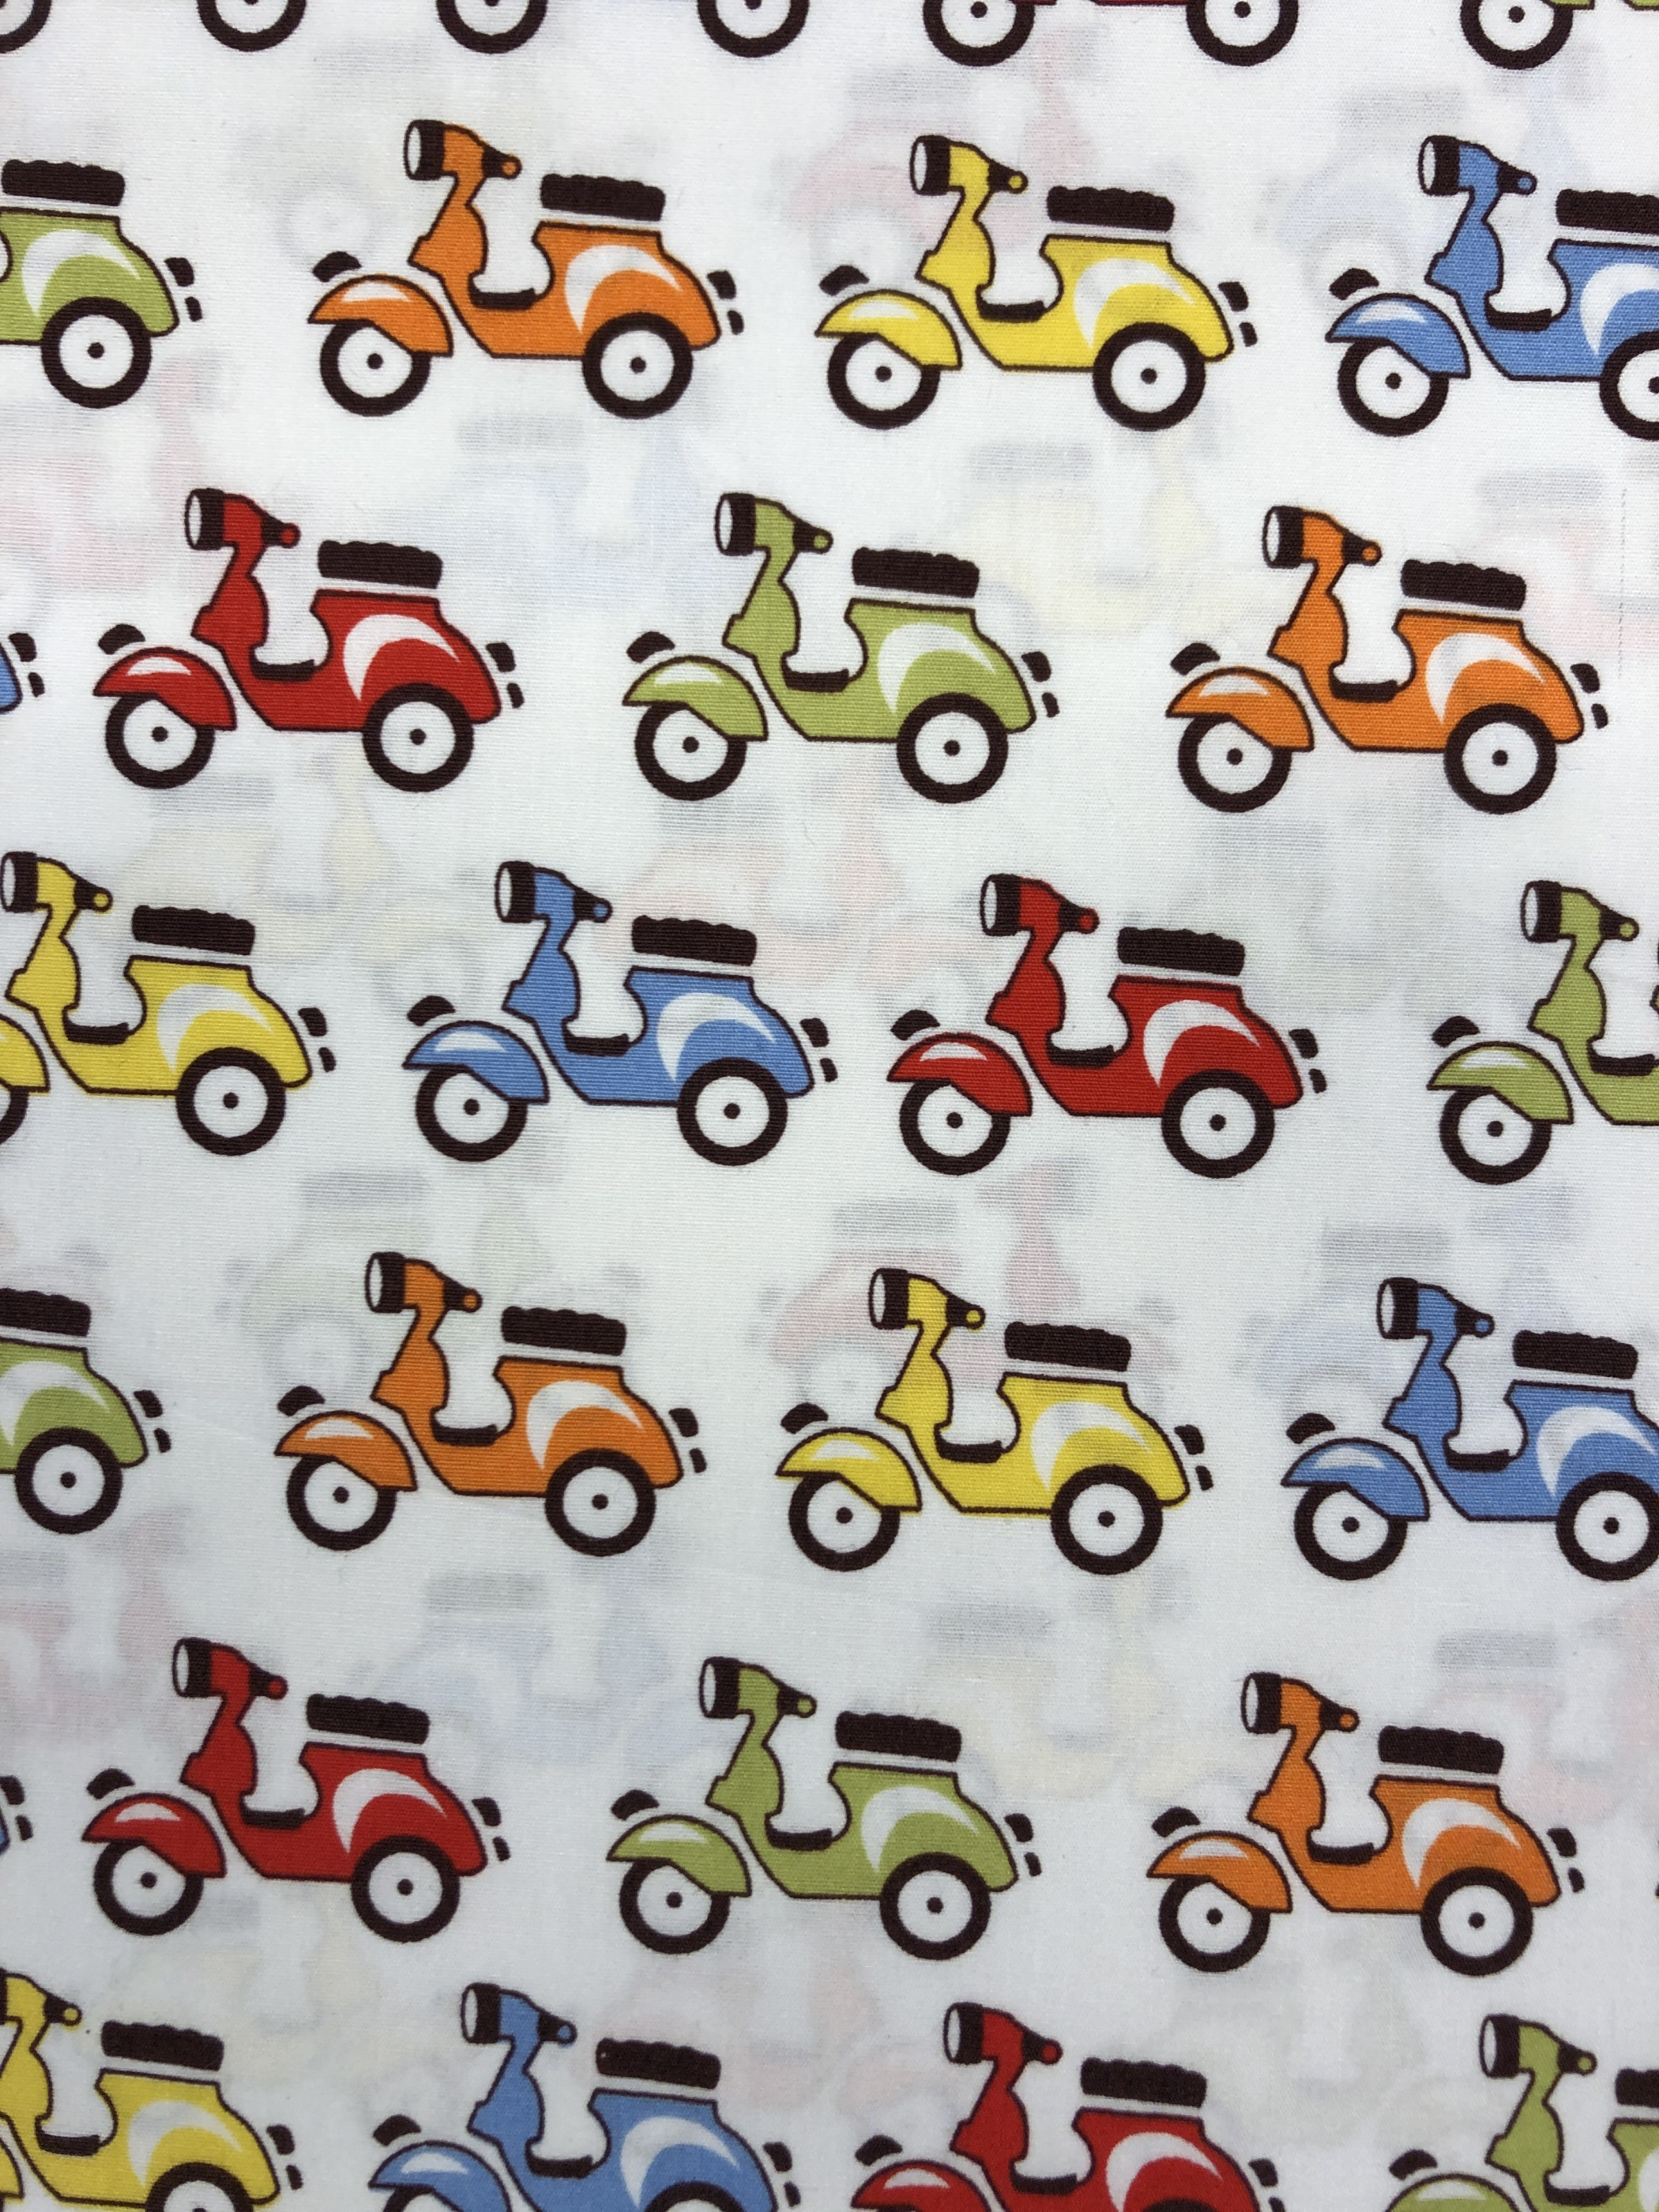 mopeder bomullsväv bomull färgglada vit orange grön röd gul blå metervara tyglust laholm modetyg barntyg